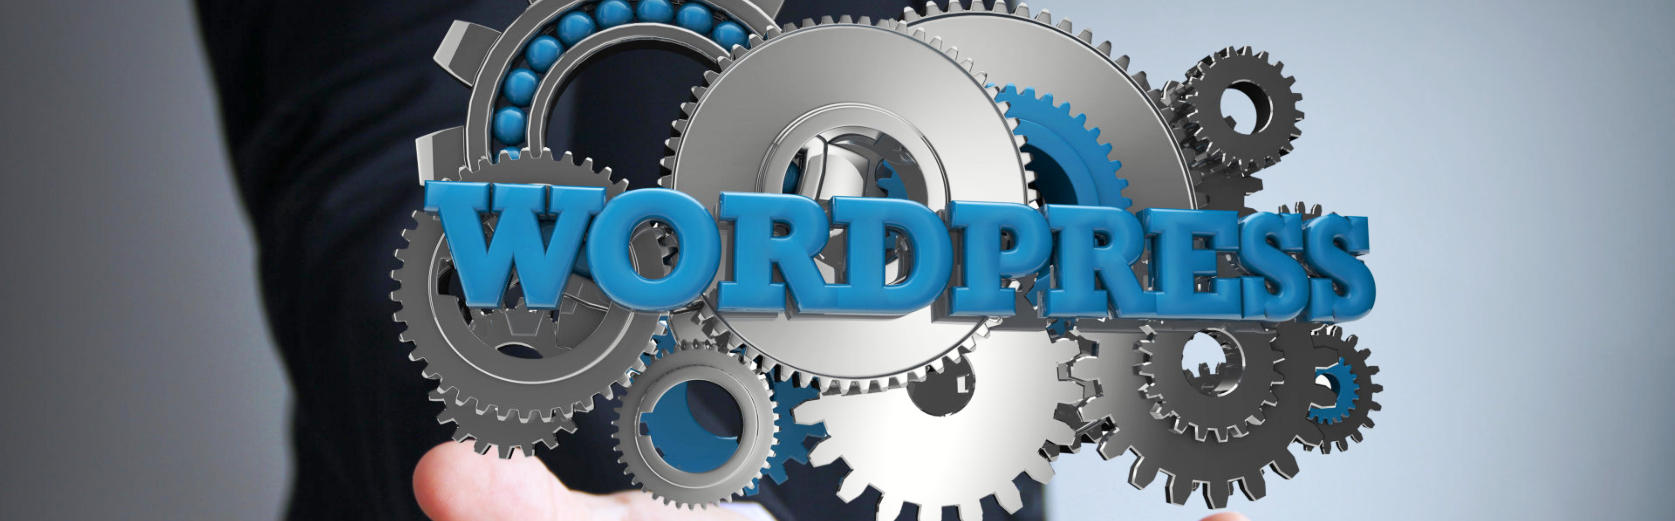 wordpress-version-5.2.2